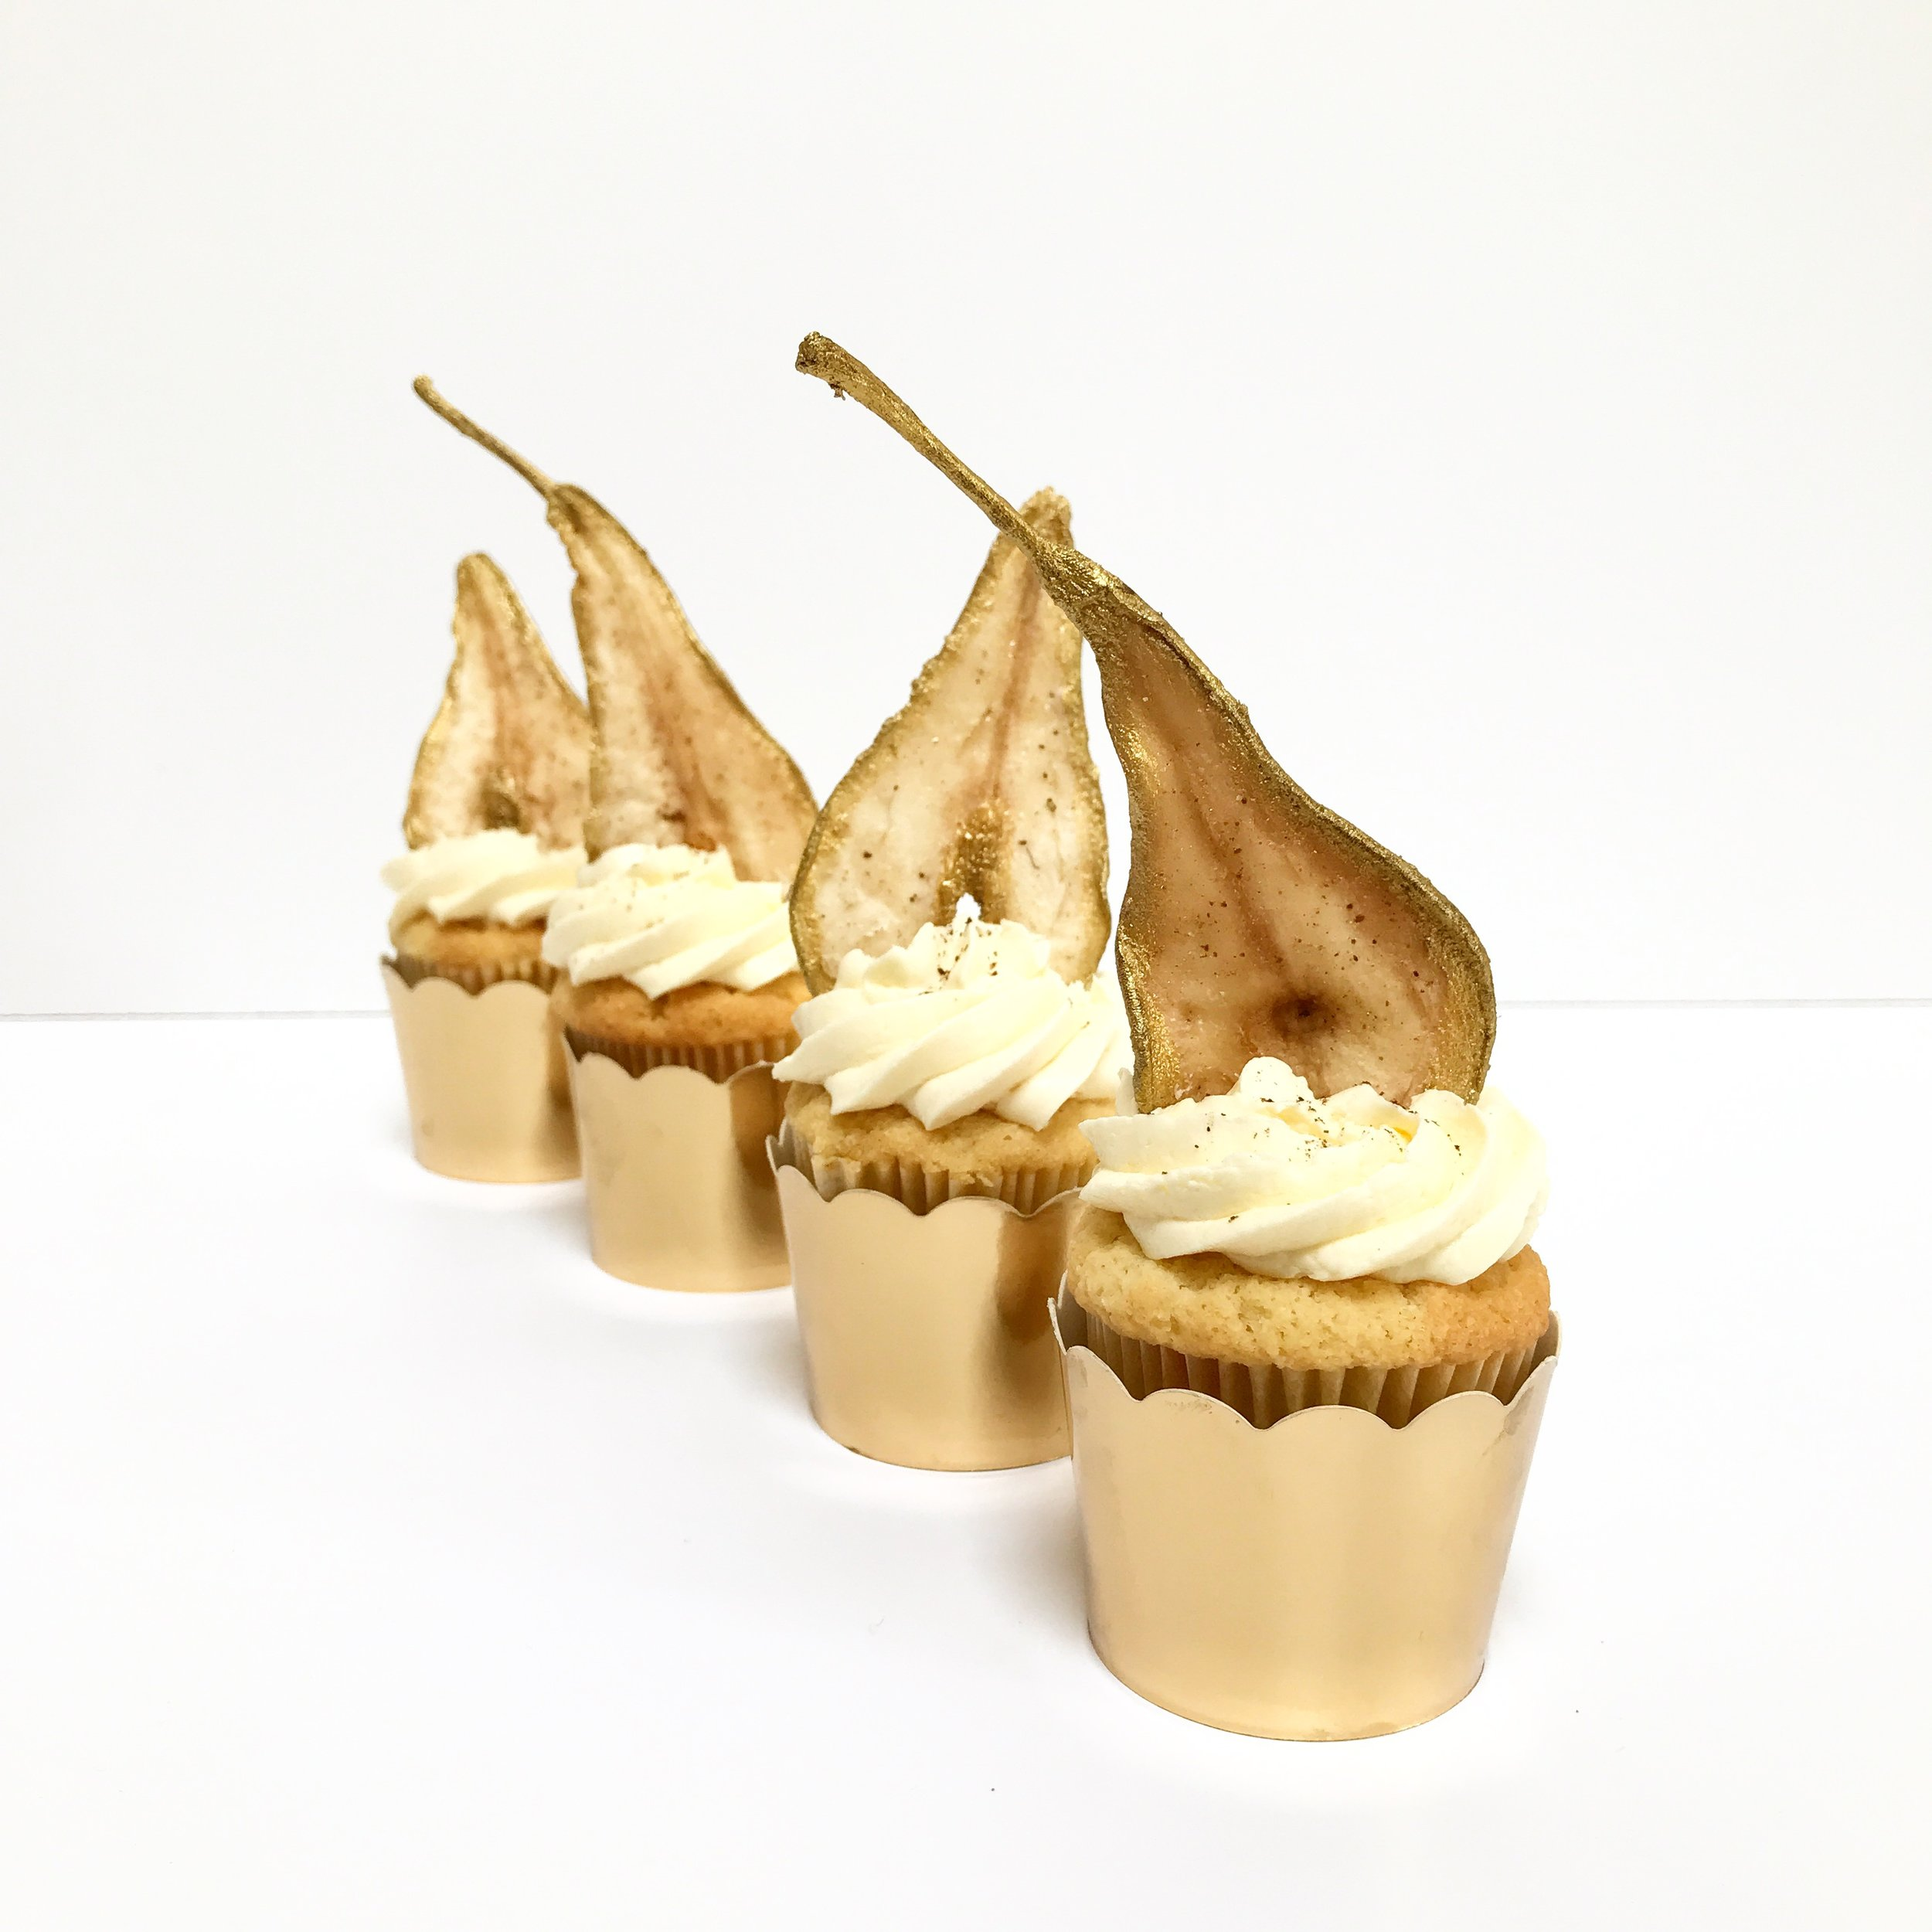 Pear, Vanilla Bean & Almond Cupcakes